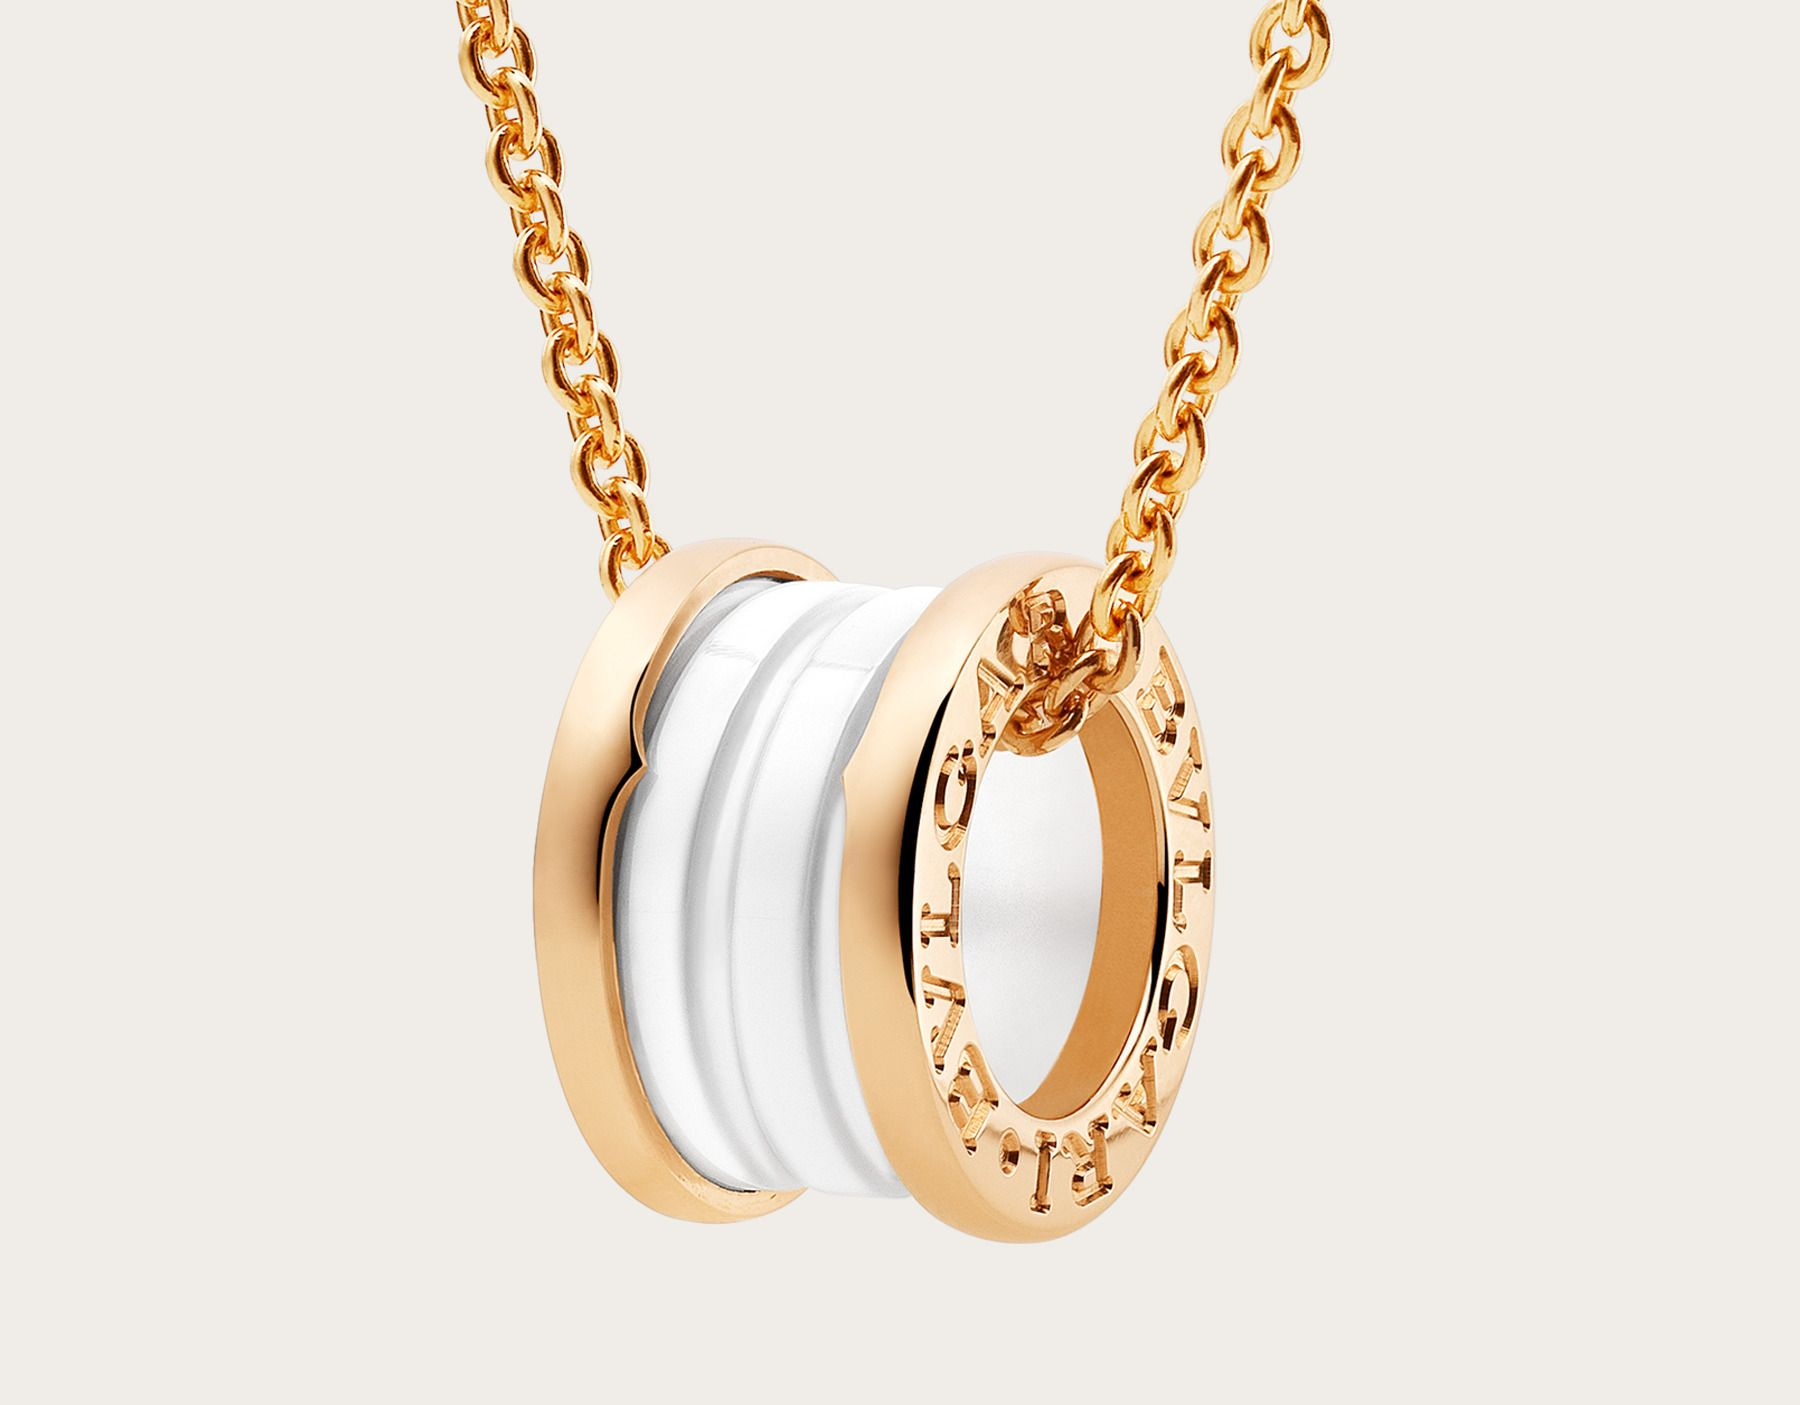 09264df62a58e b.zero1 18k rose gold and white ceramic necklace